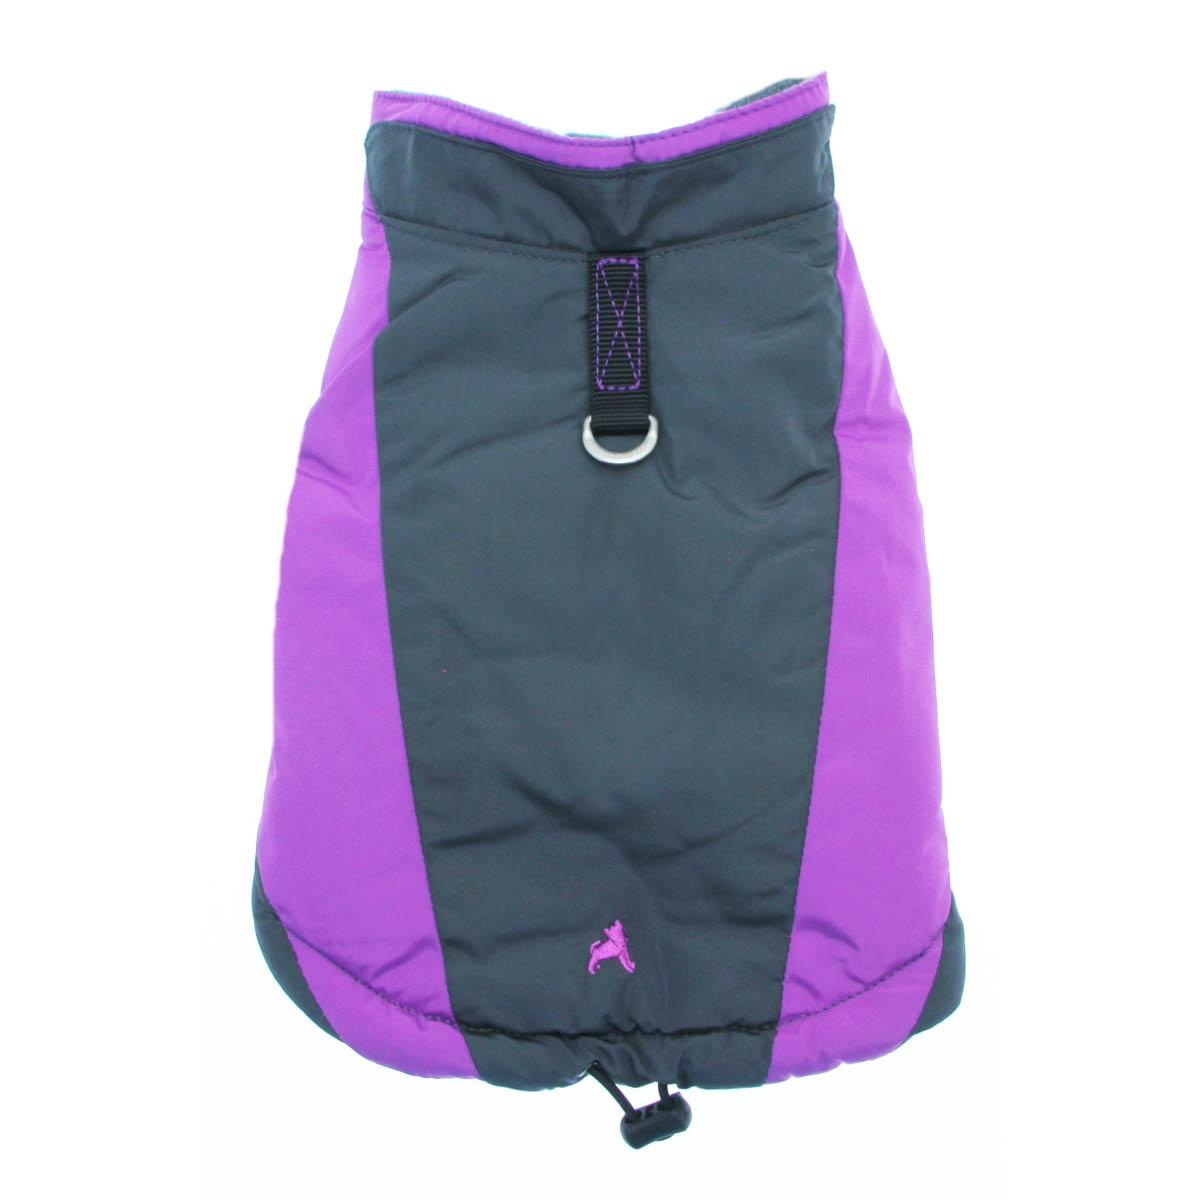 Trekking Dog Jacket by Gooby - Purple